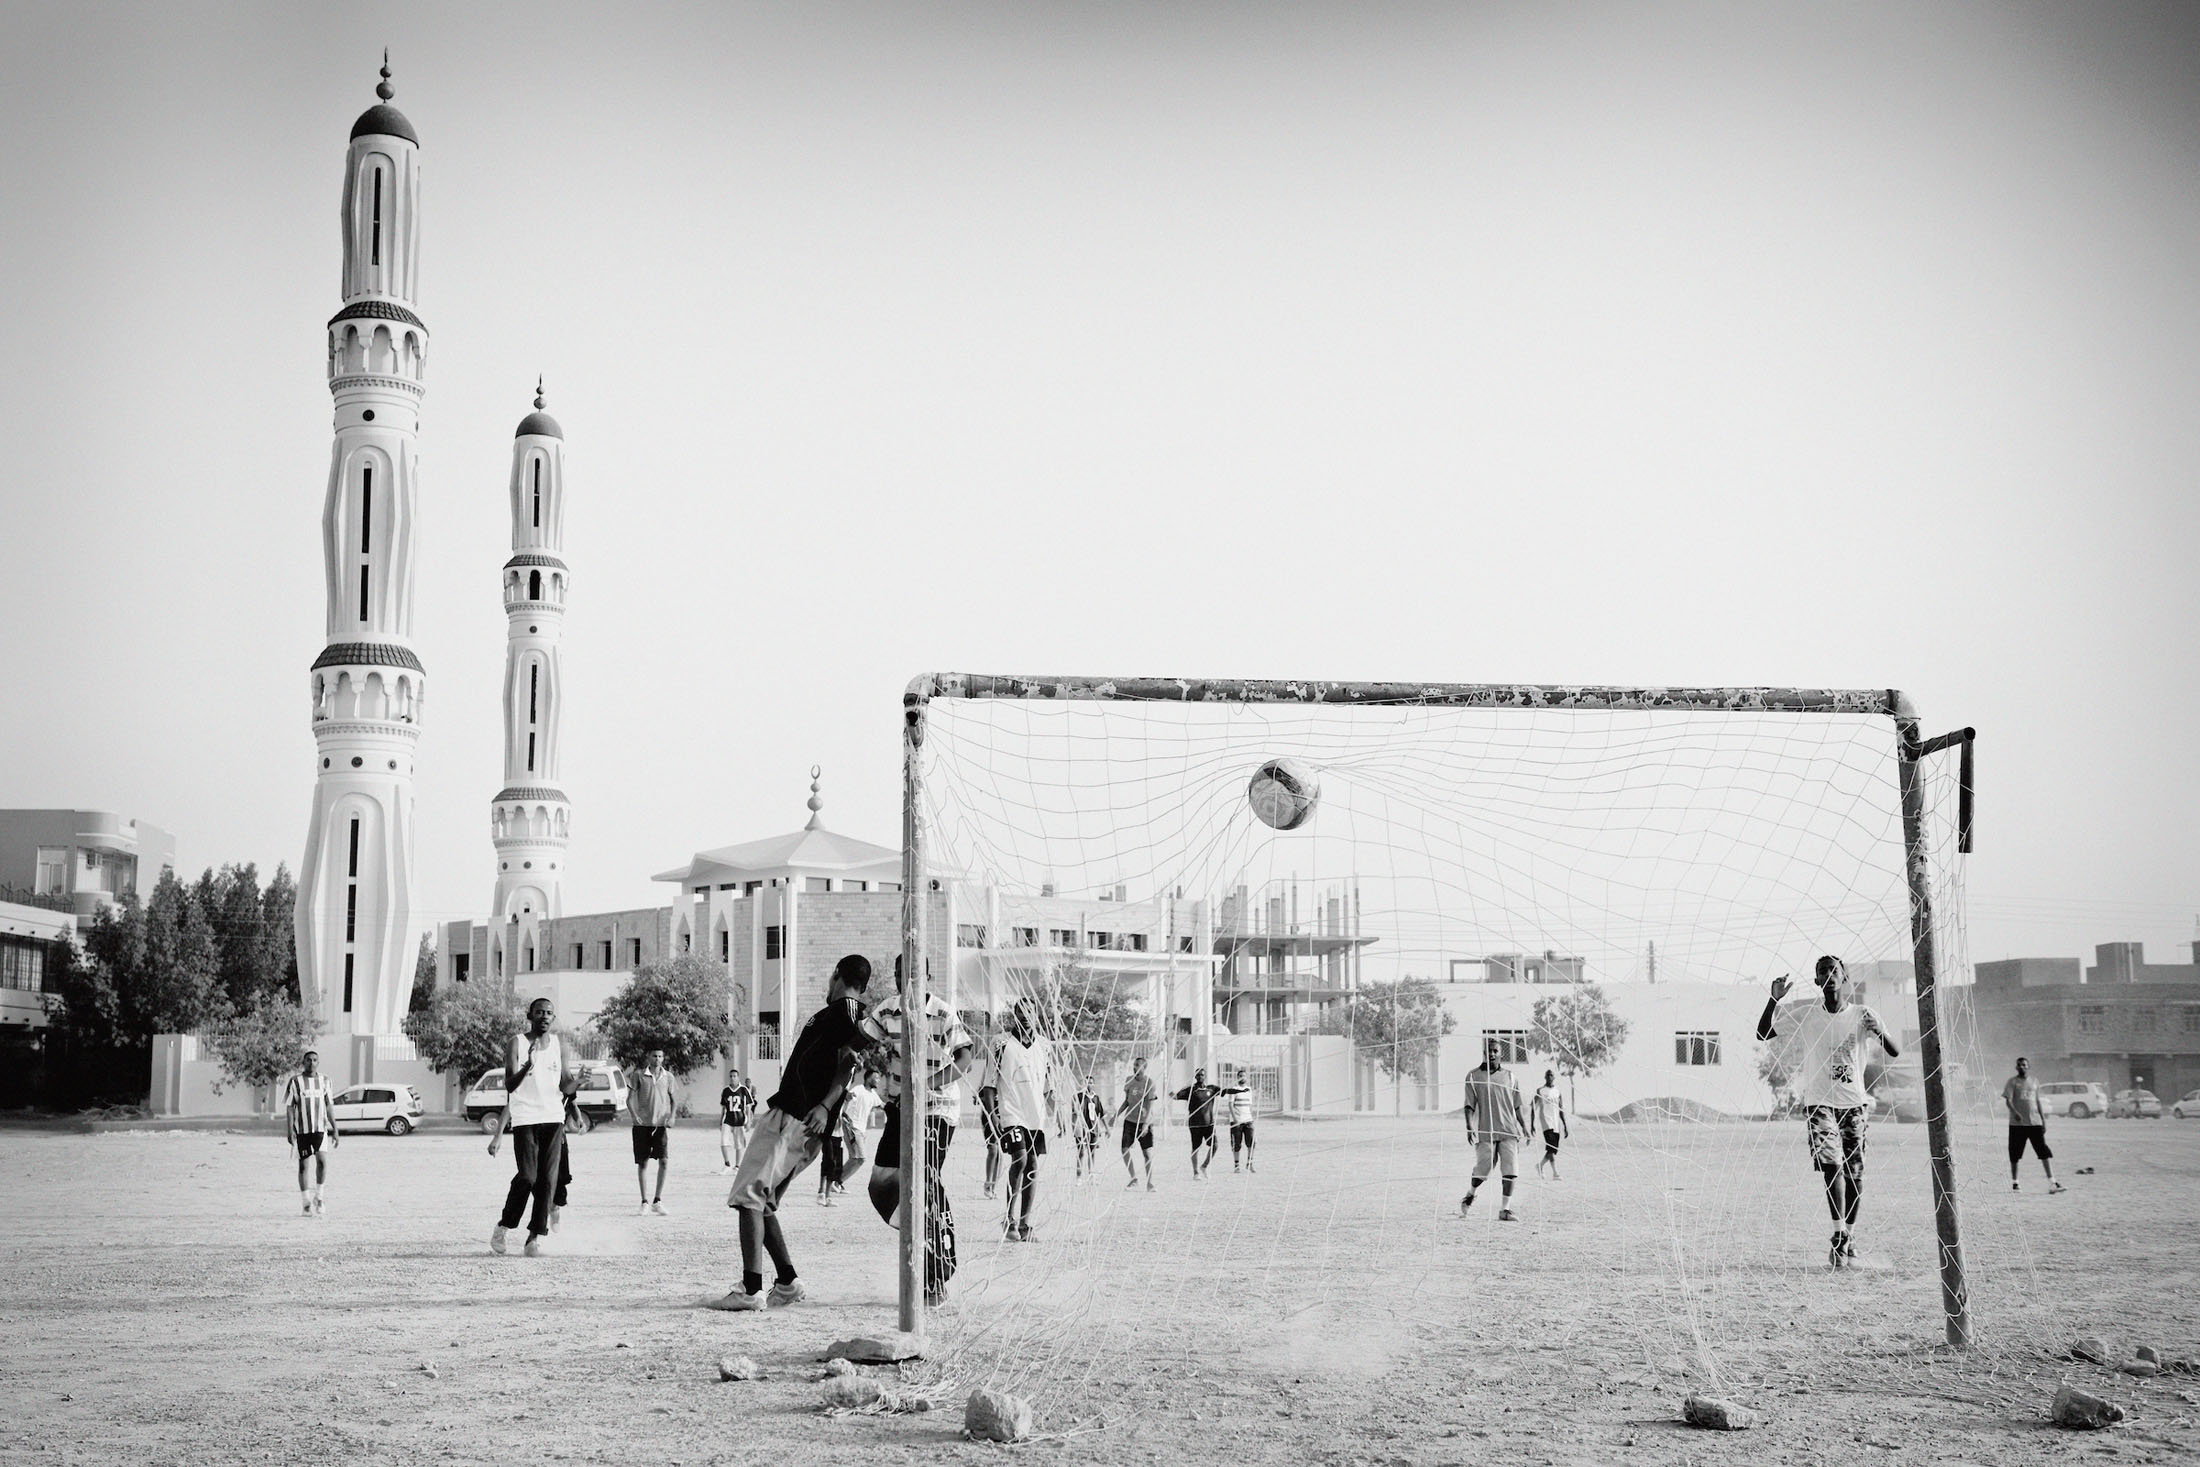 khartoum footbal.jpg